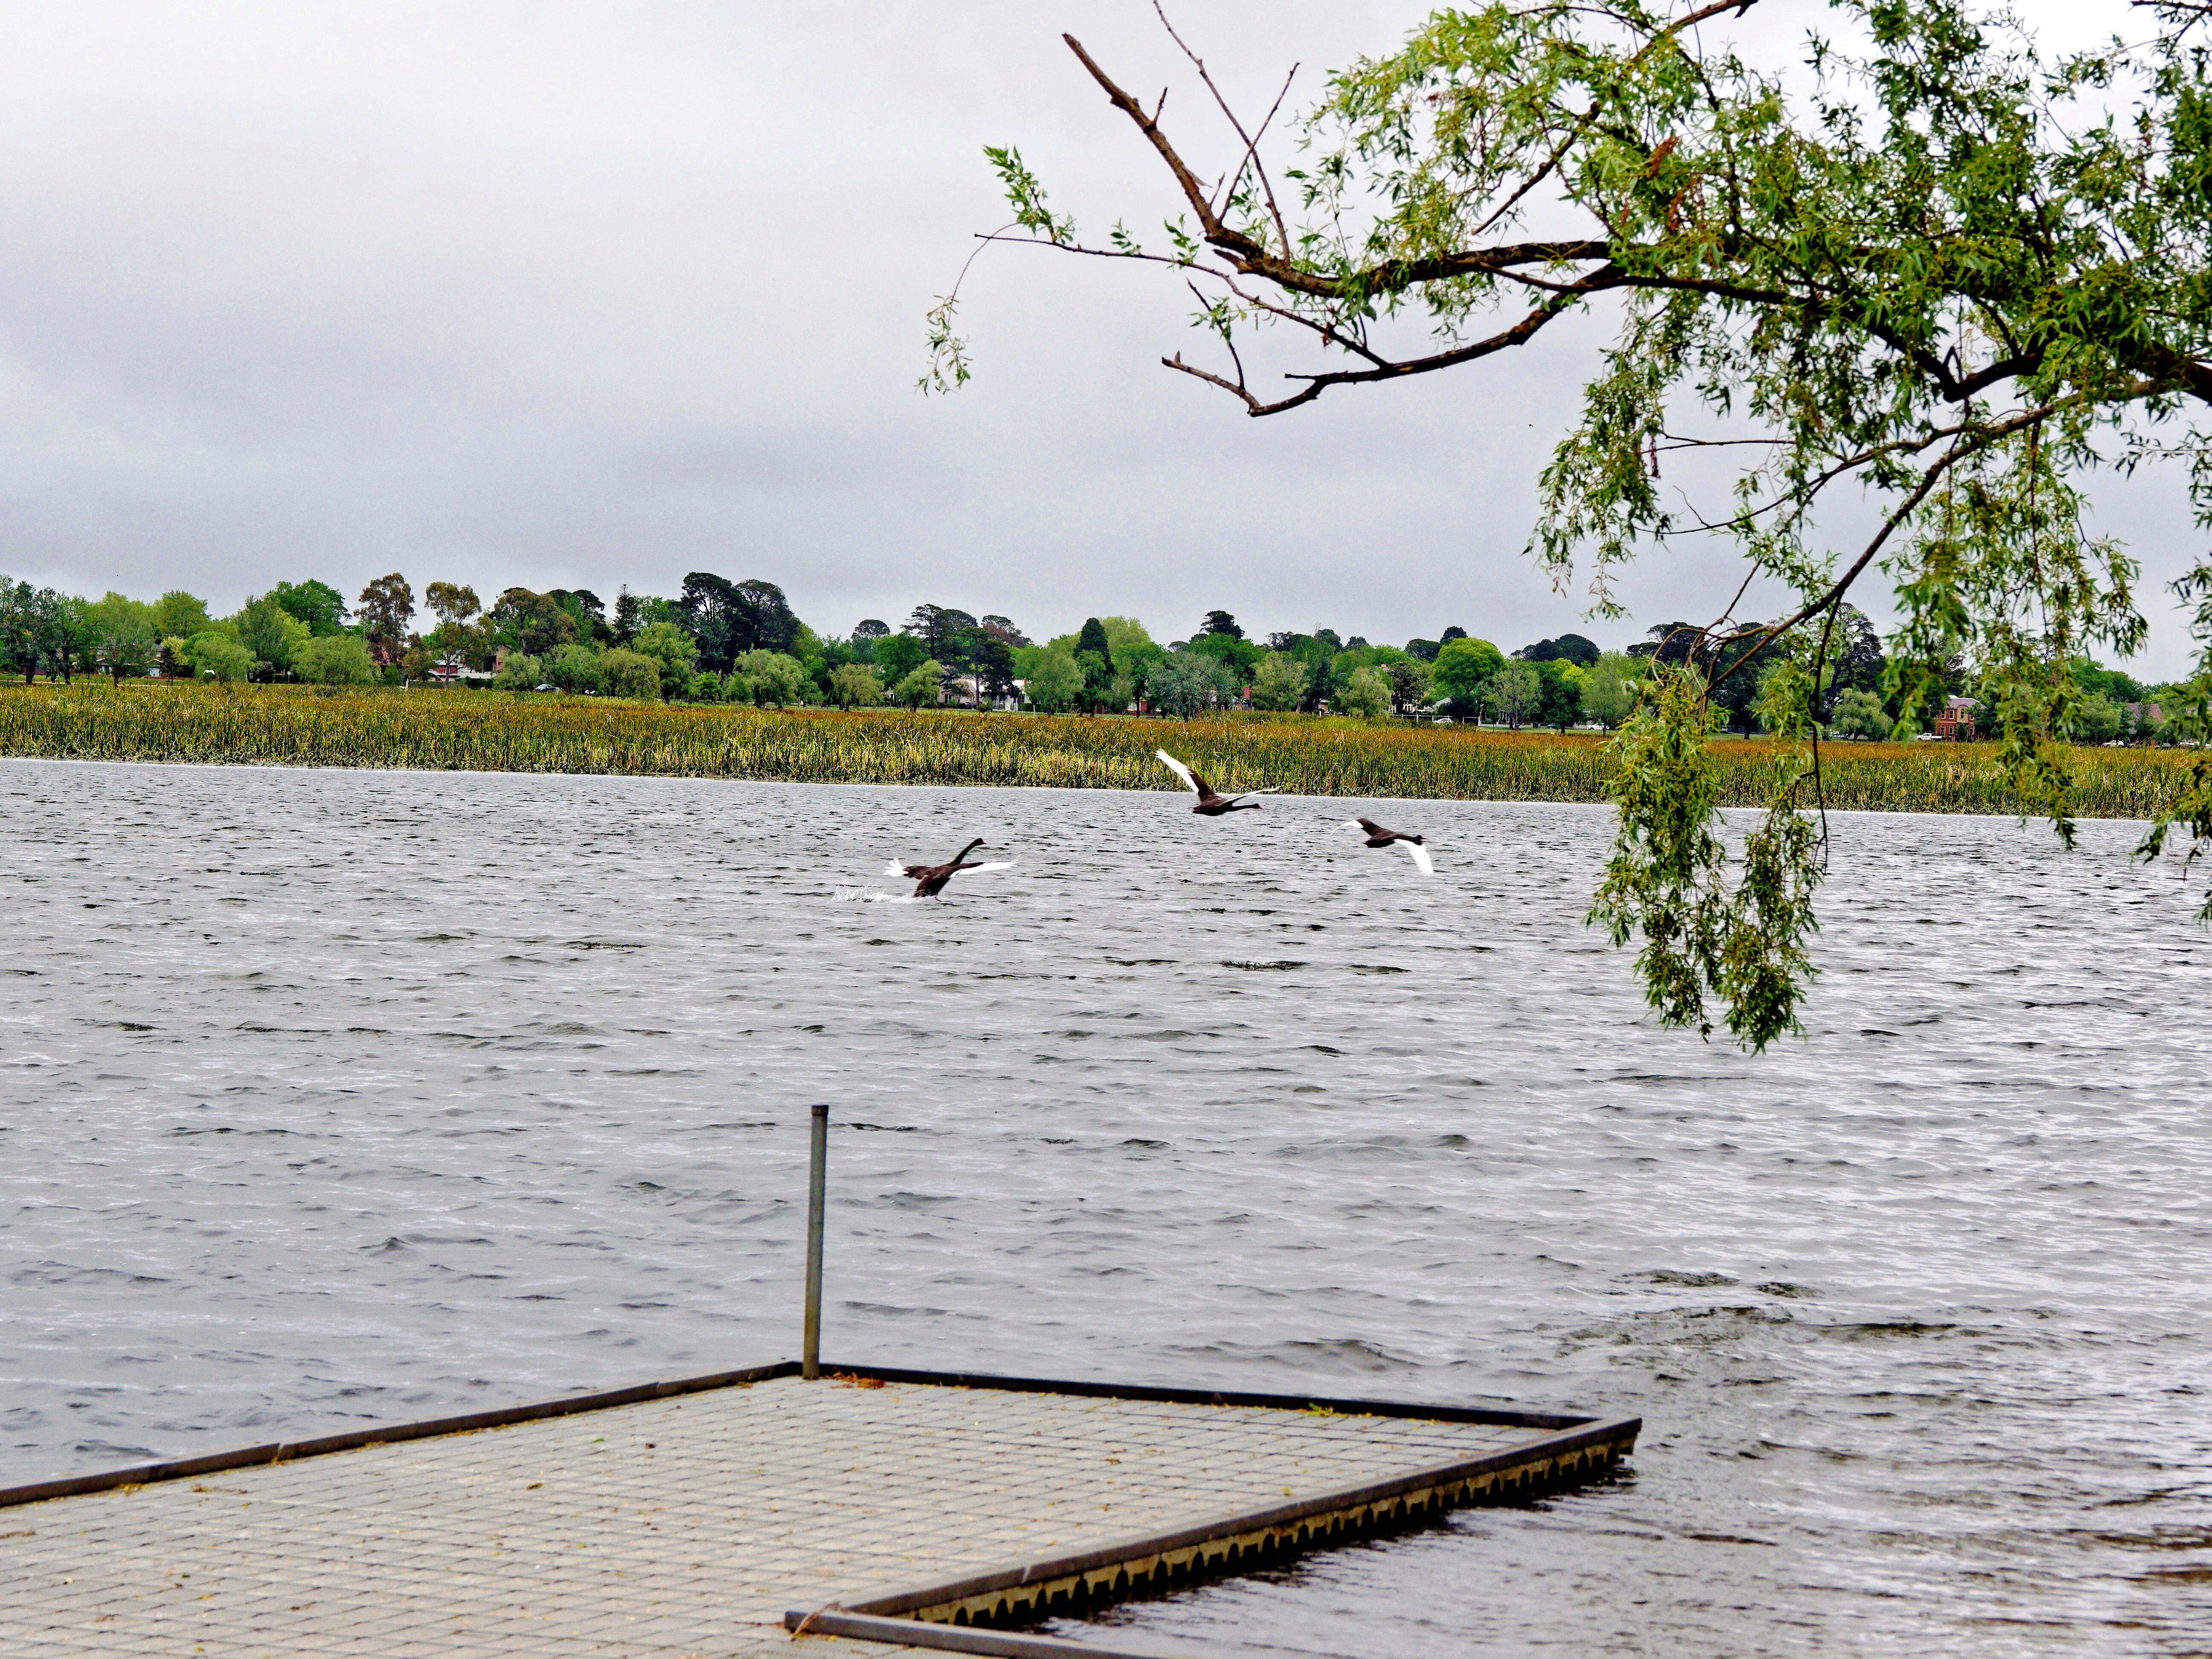 Swans-5.jpeg